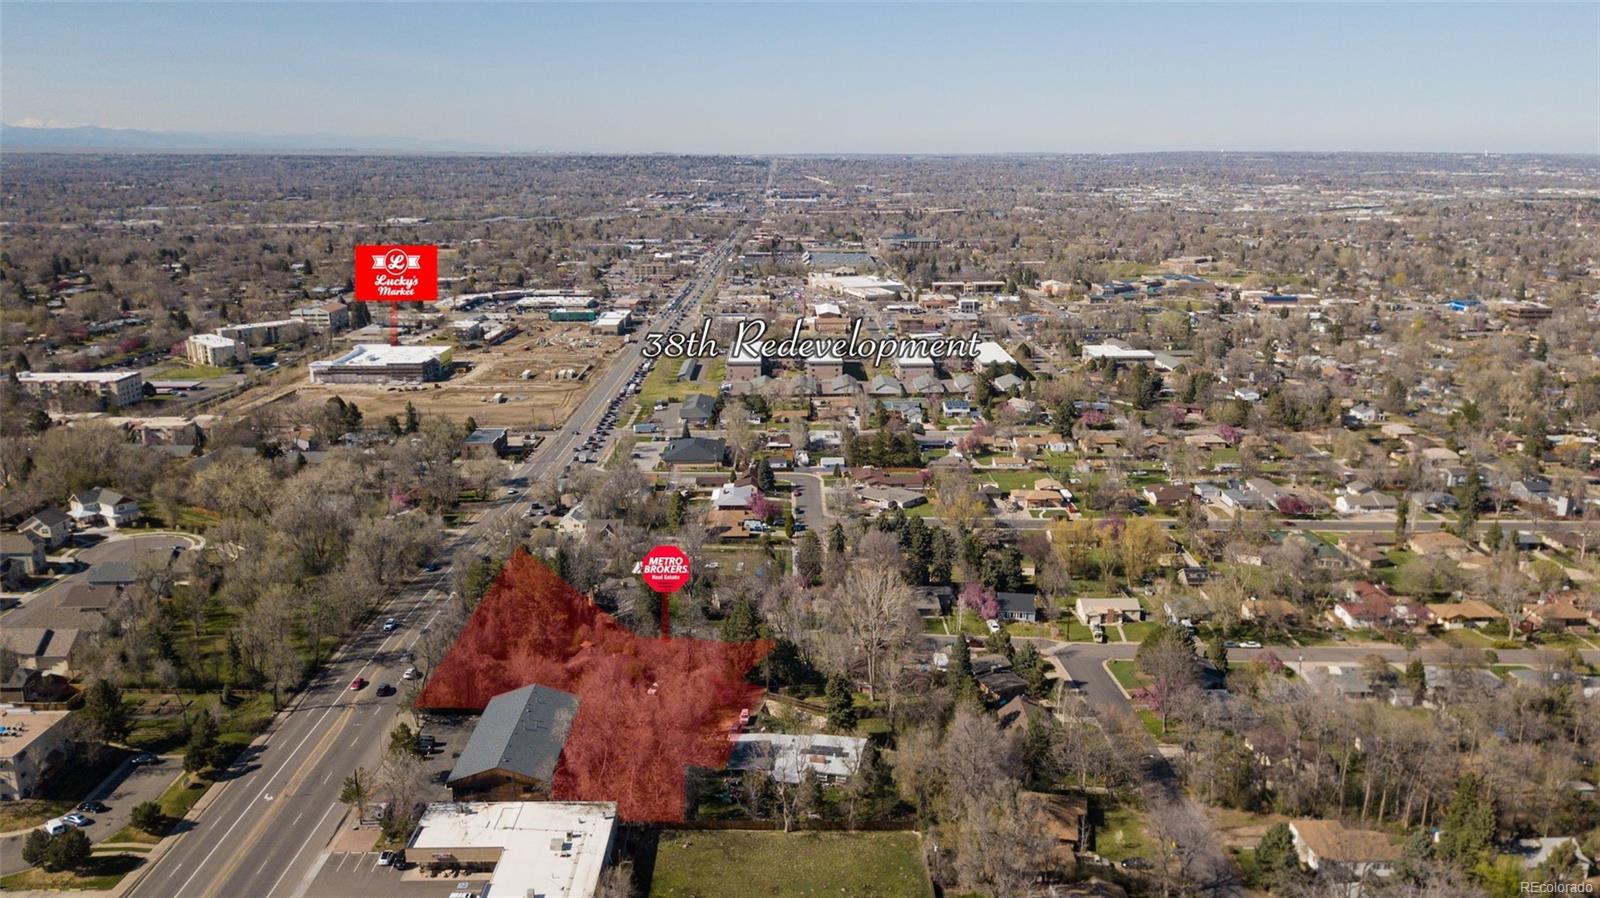 7580 33rd Avenue, Wheat Ridge, CO 80033 - Wheat Ridge, CO real estate listing